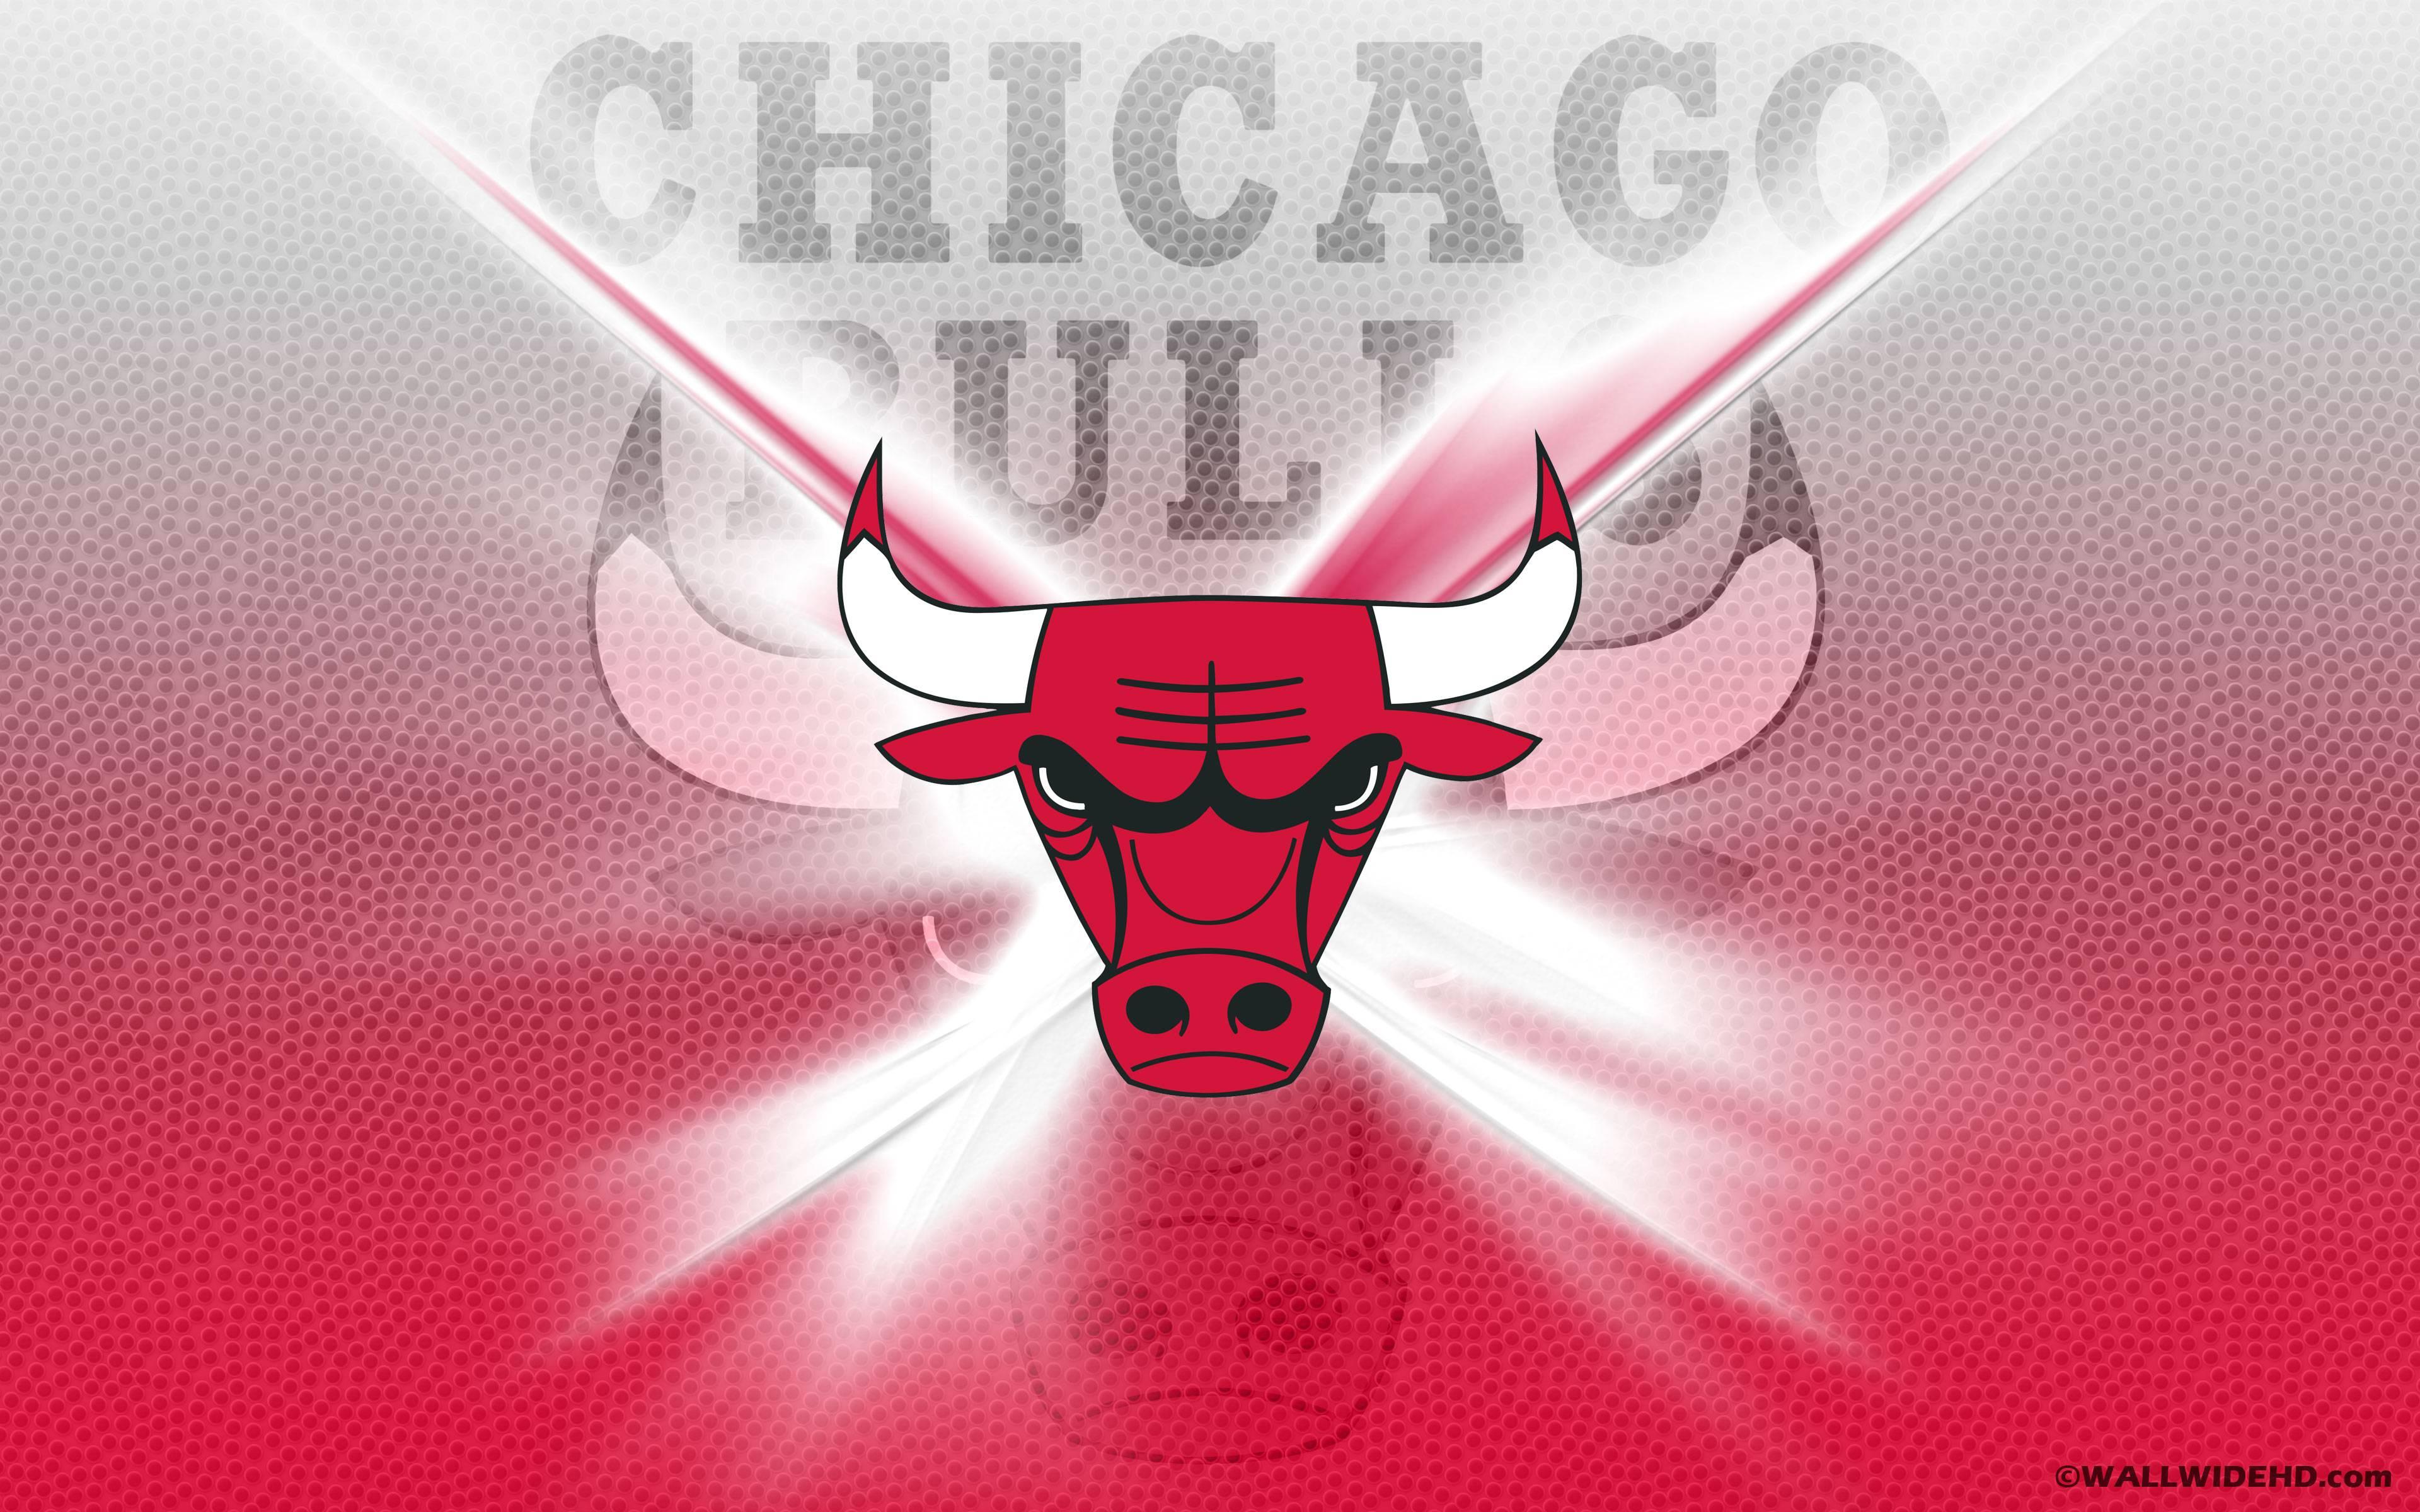 Chicago Bulls Wallpapers HD 2015 - Wallpaper CaveLebron James Wallpaper 2017 Mvp